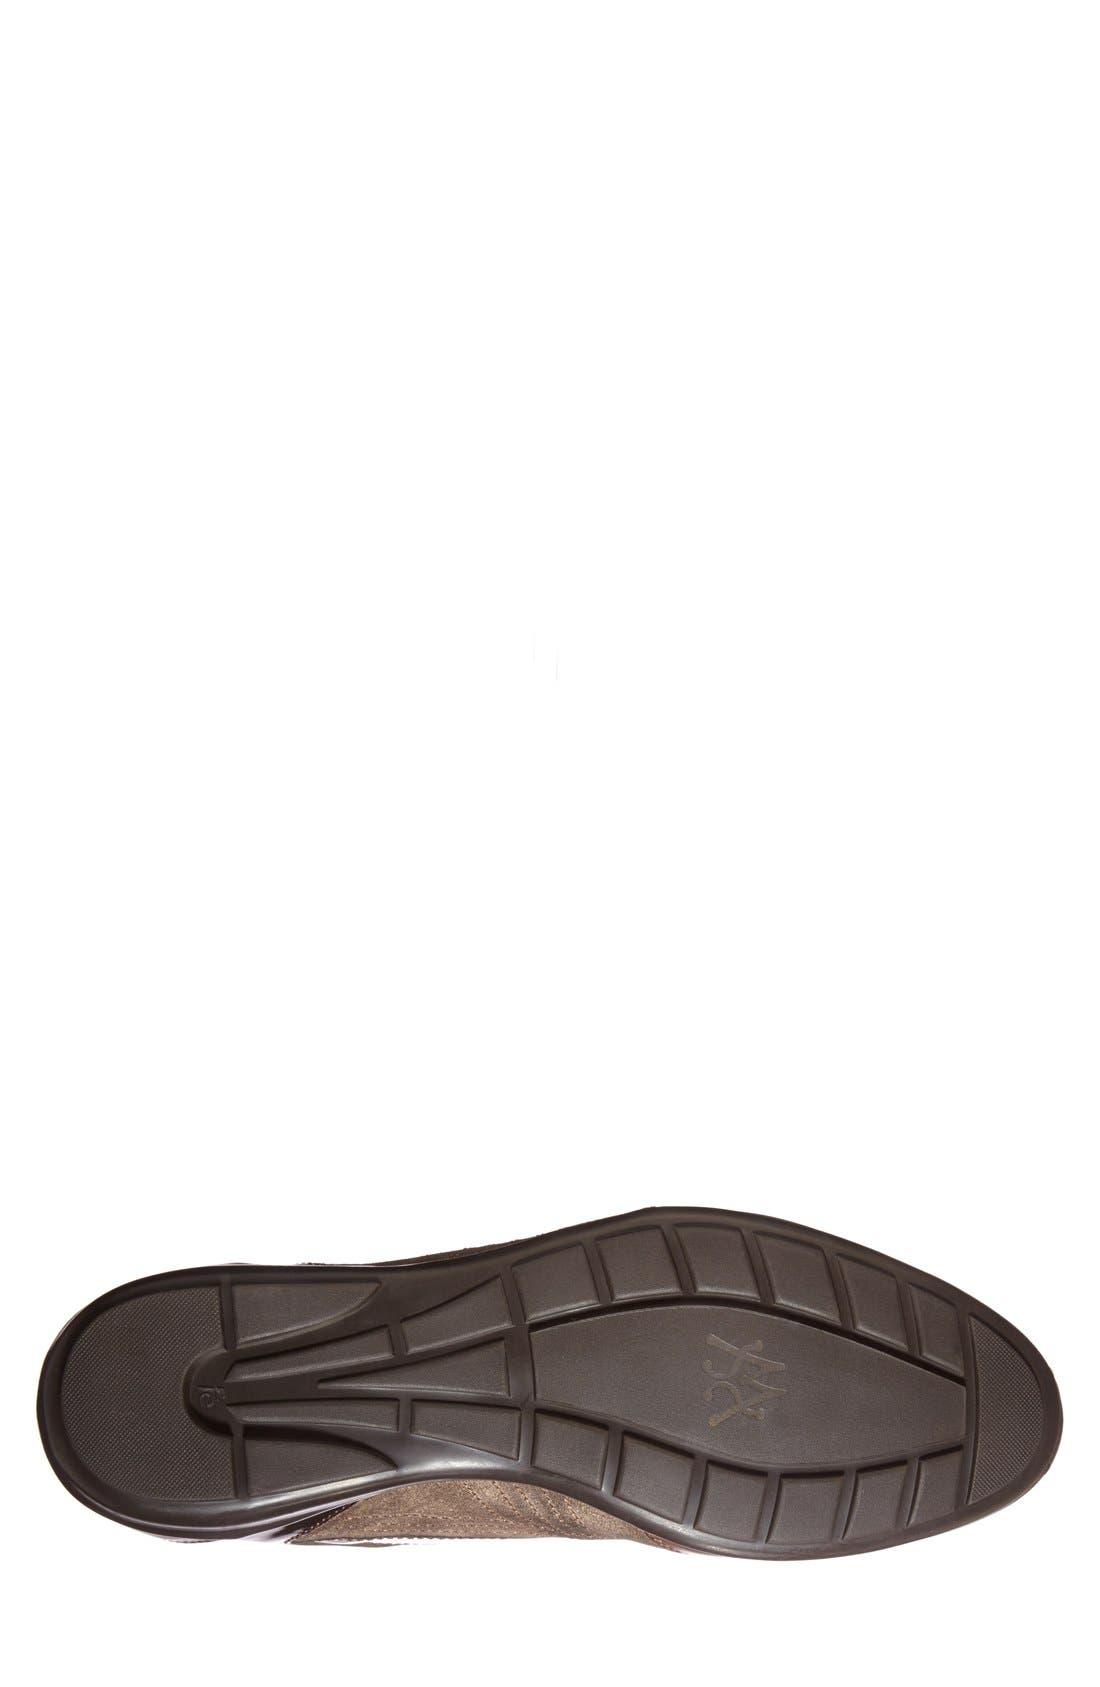 'Vega' Sneaker,                             Alternate thumbnail 2, color,                             MOCHA/ TAUPE